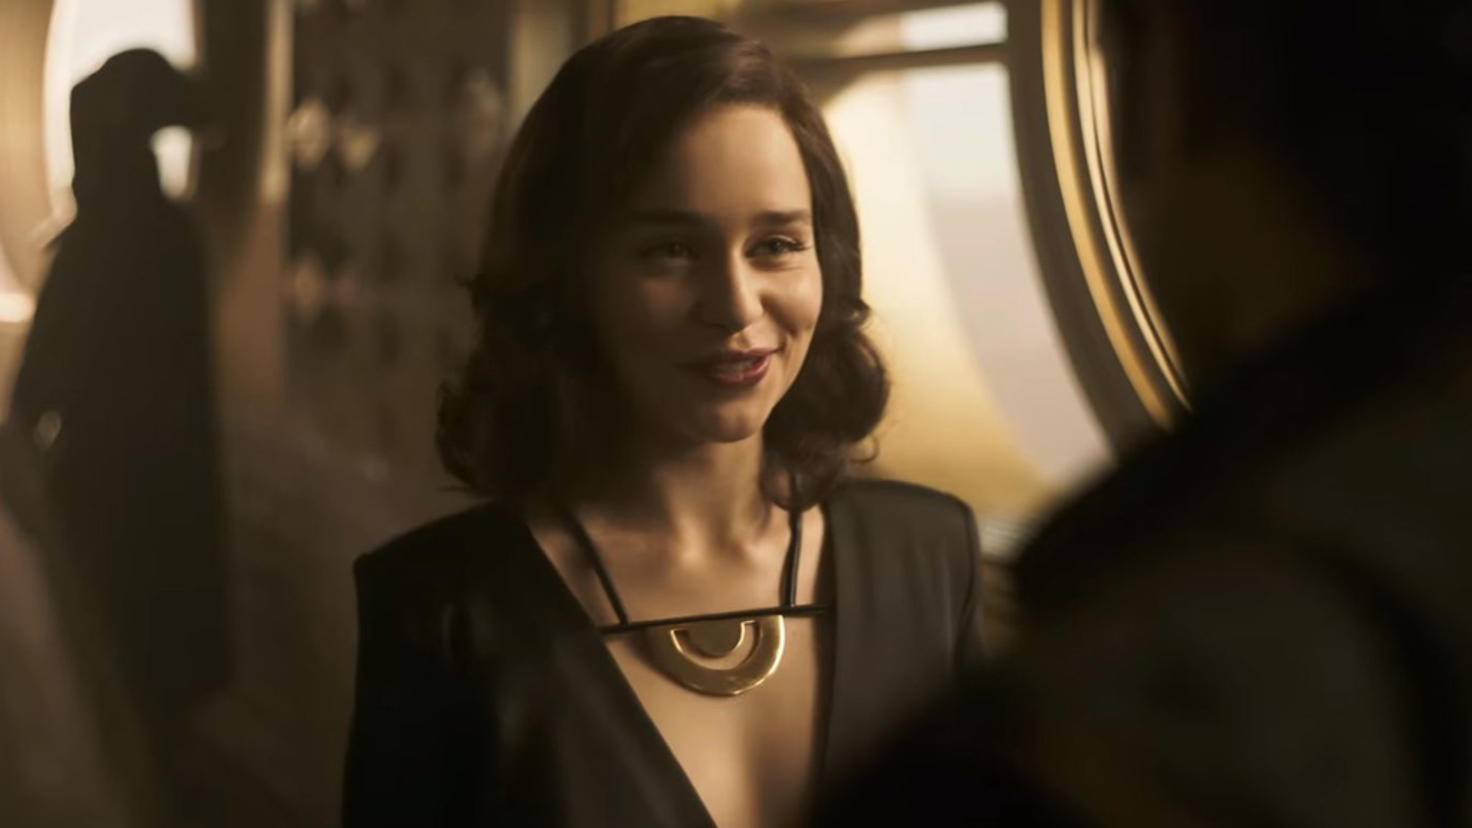 Solo_Trailer_Emilia Clarke_YouTube_Star Wars